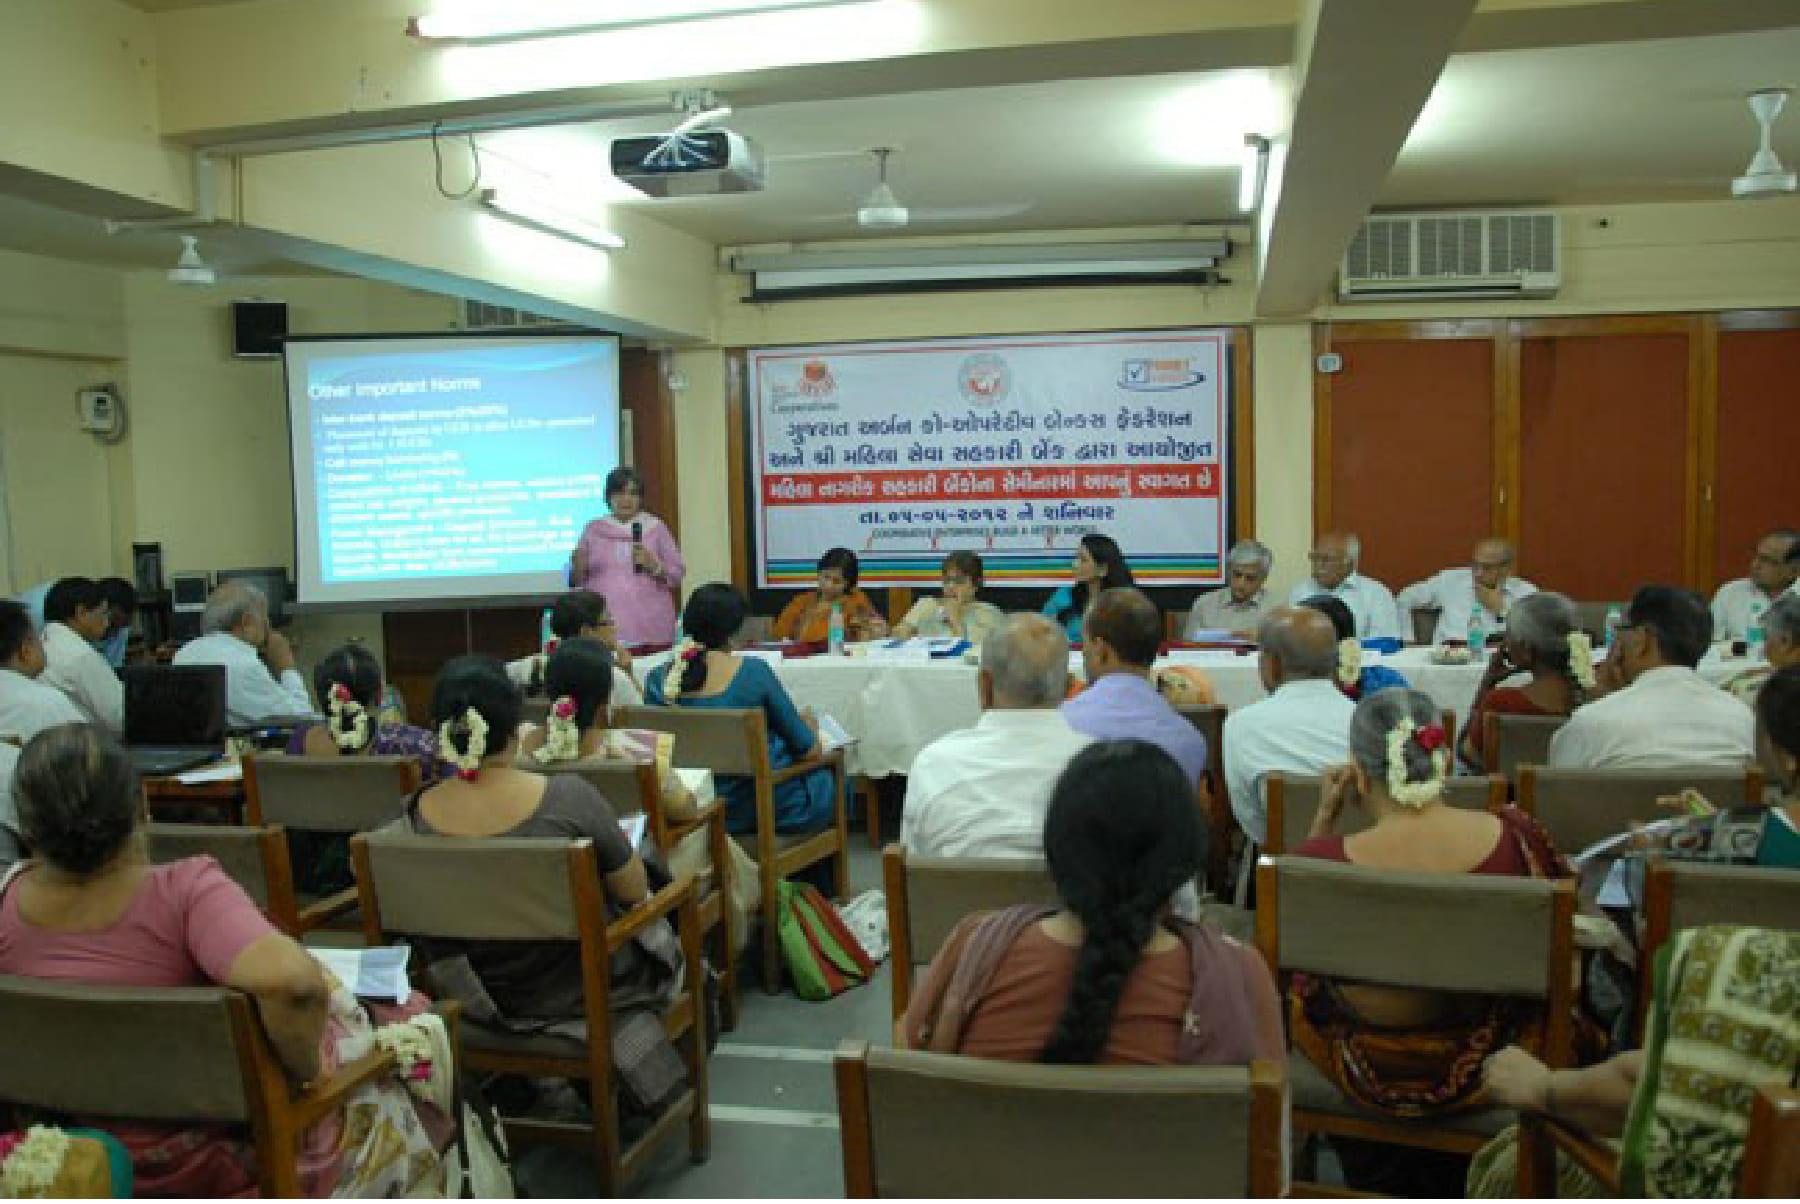 Seminar organized by GUCBF & Mahila Co-operative Bank